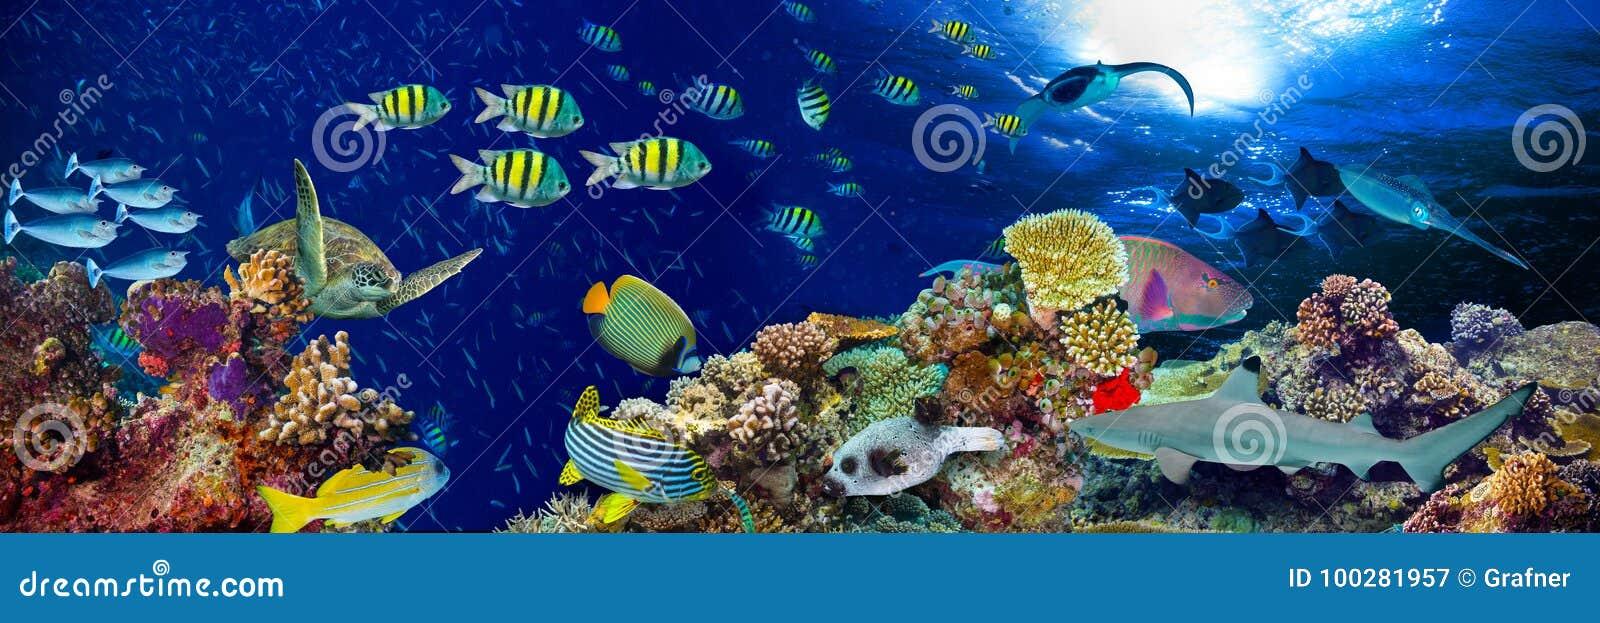 Панорама подводного ландшафта кораллового рифа широкая